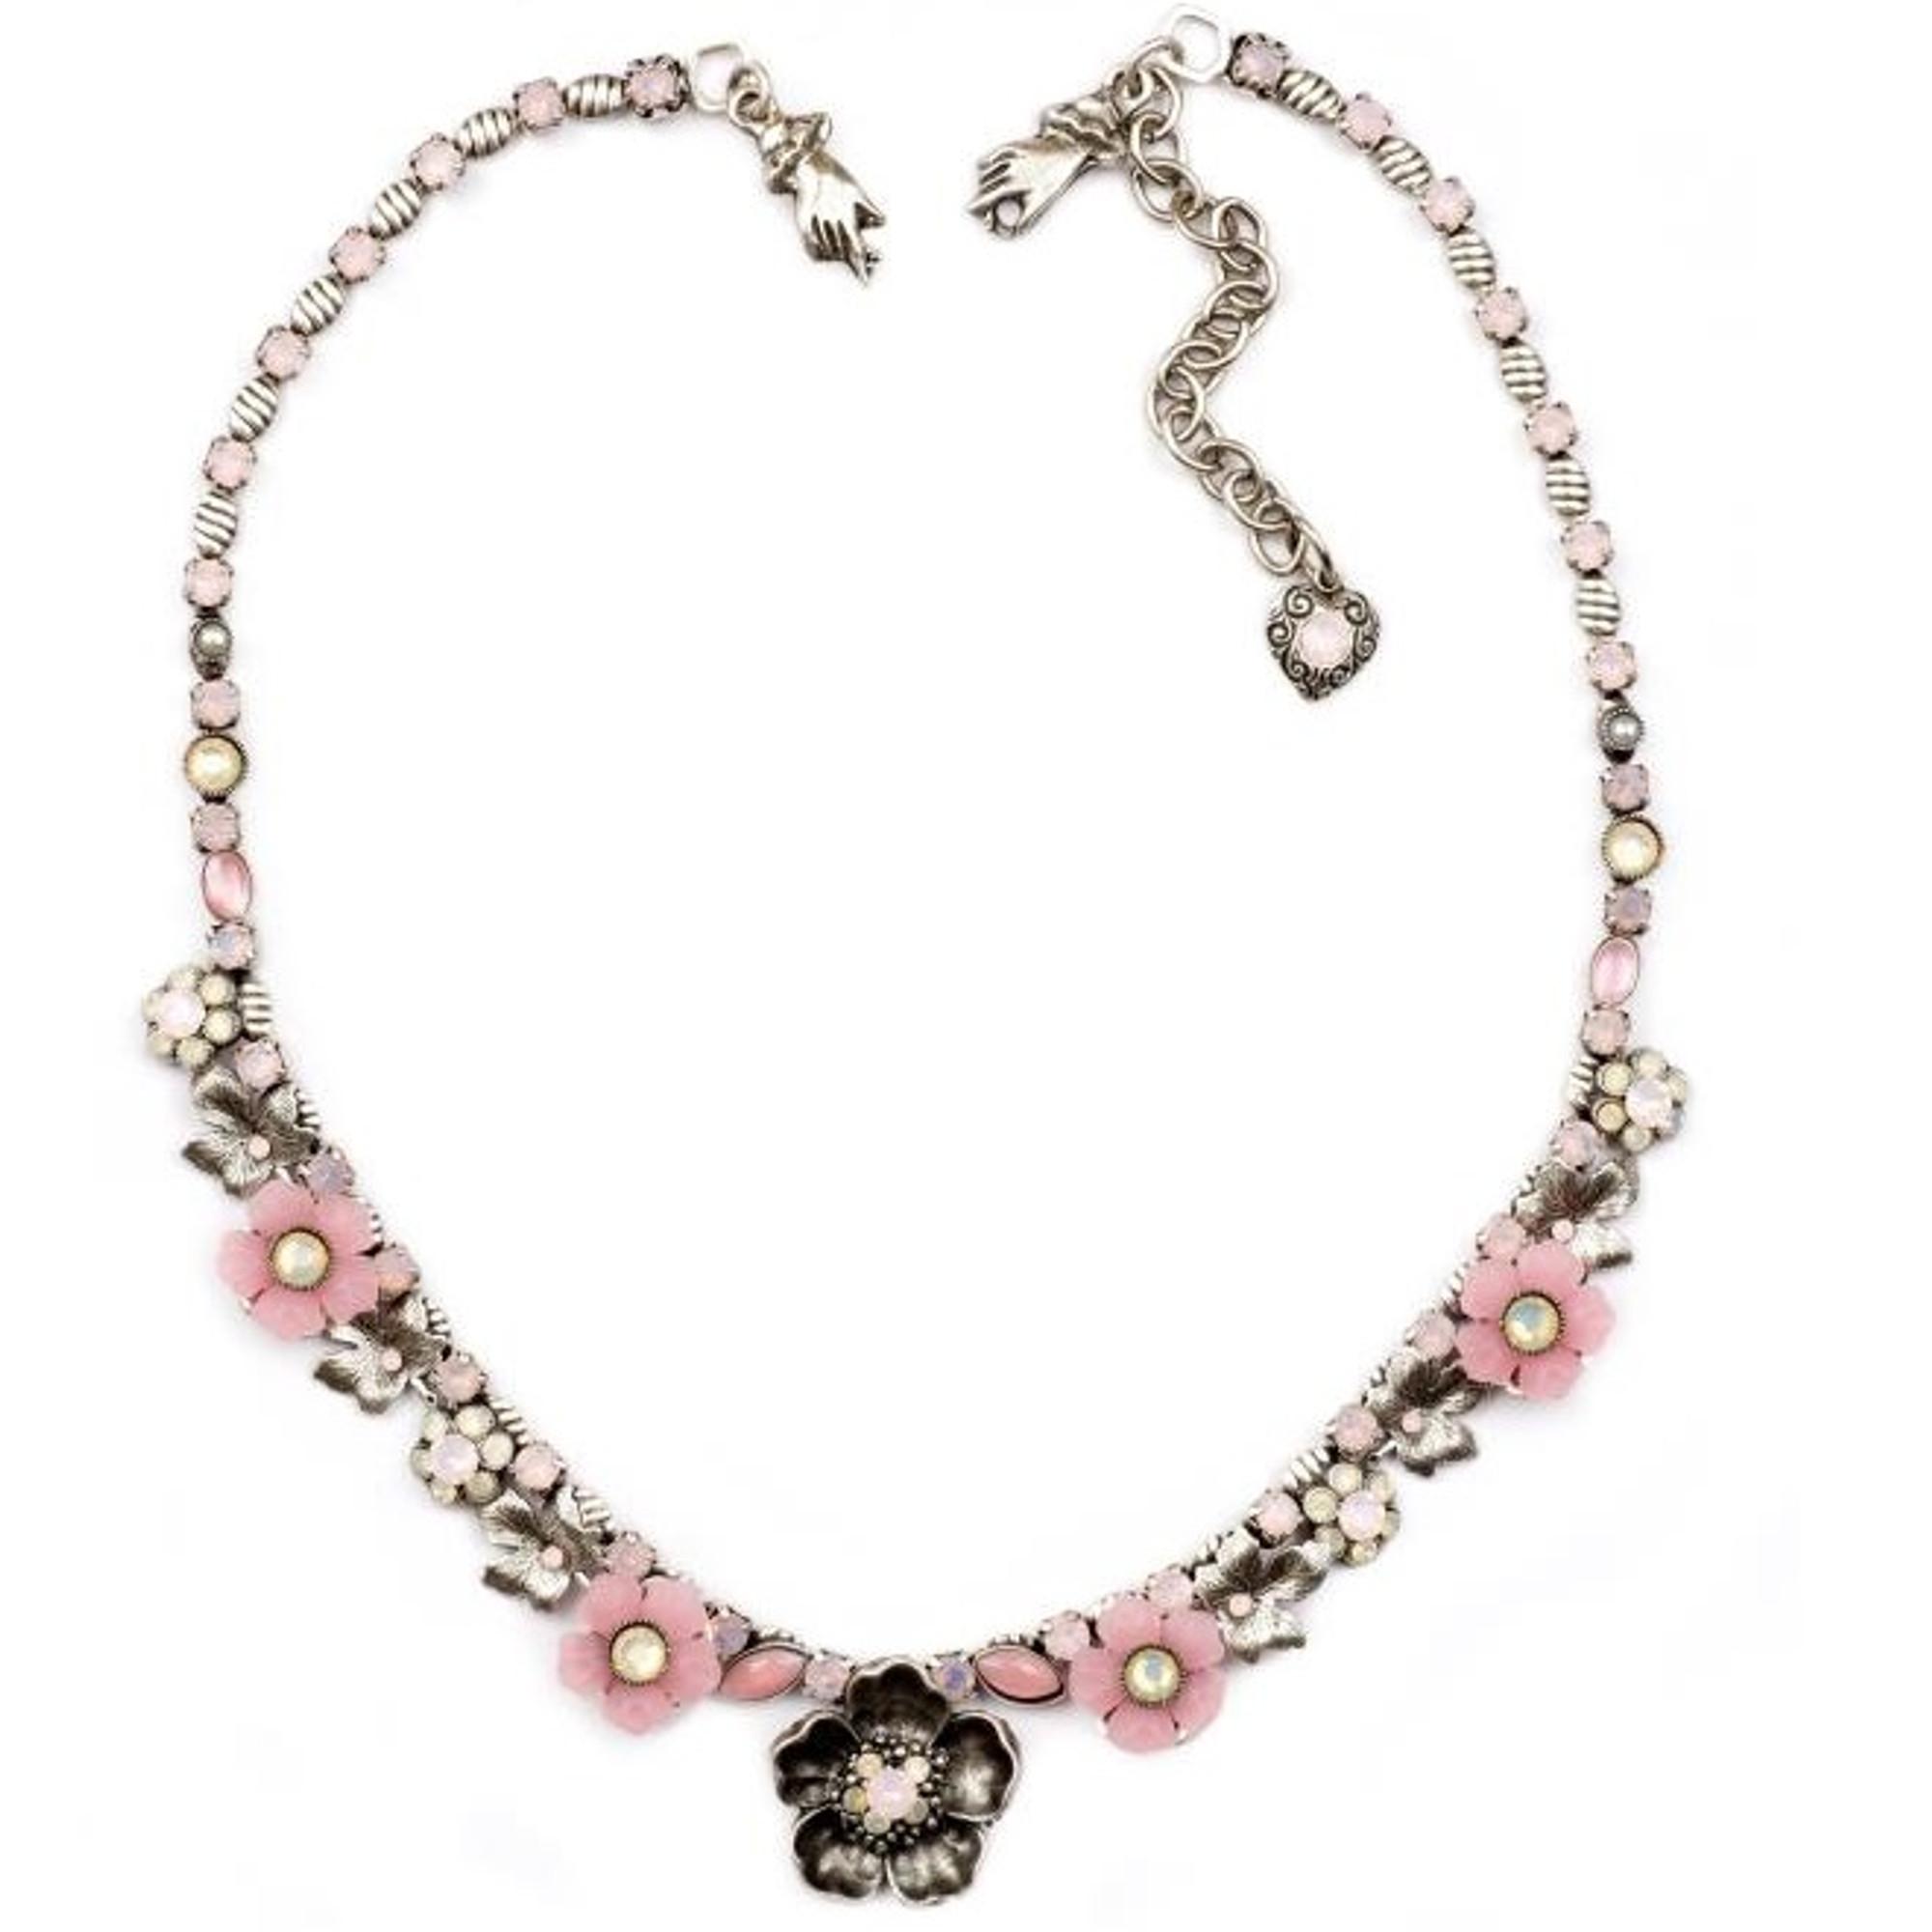 Pink flower necklace pewter la contessa mary demarco pink flower pewter necklace nature jewelry nk 9560 rwo mightylinksfo